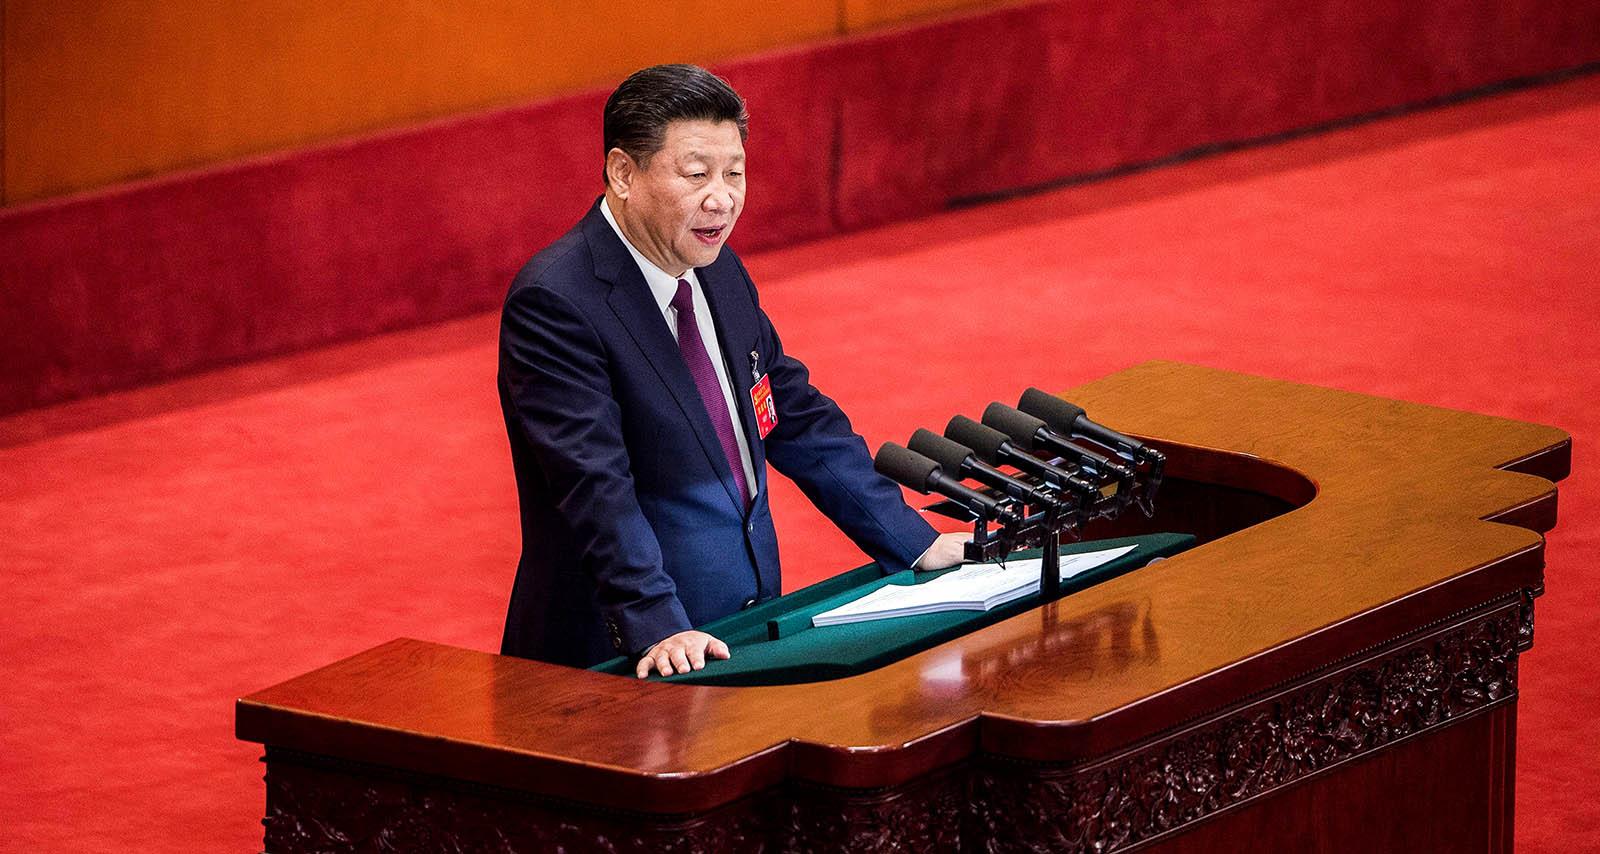 President Xi Sharpens China's Bid for Superpower Status